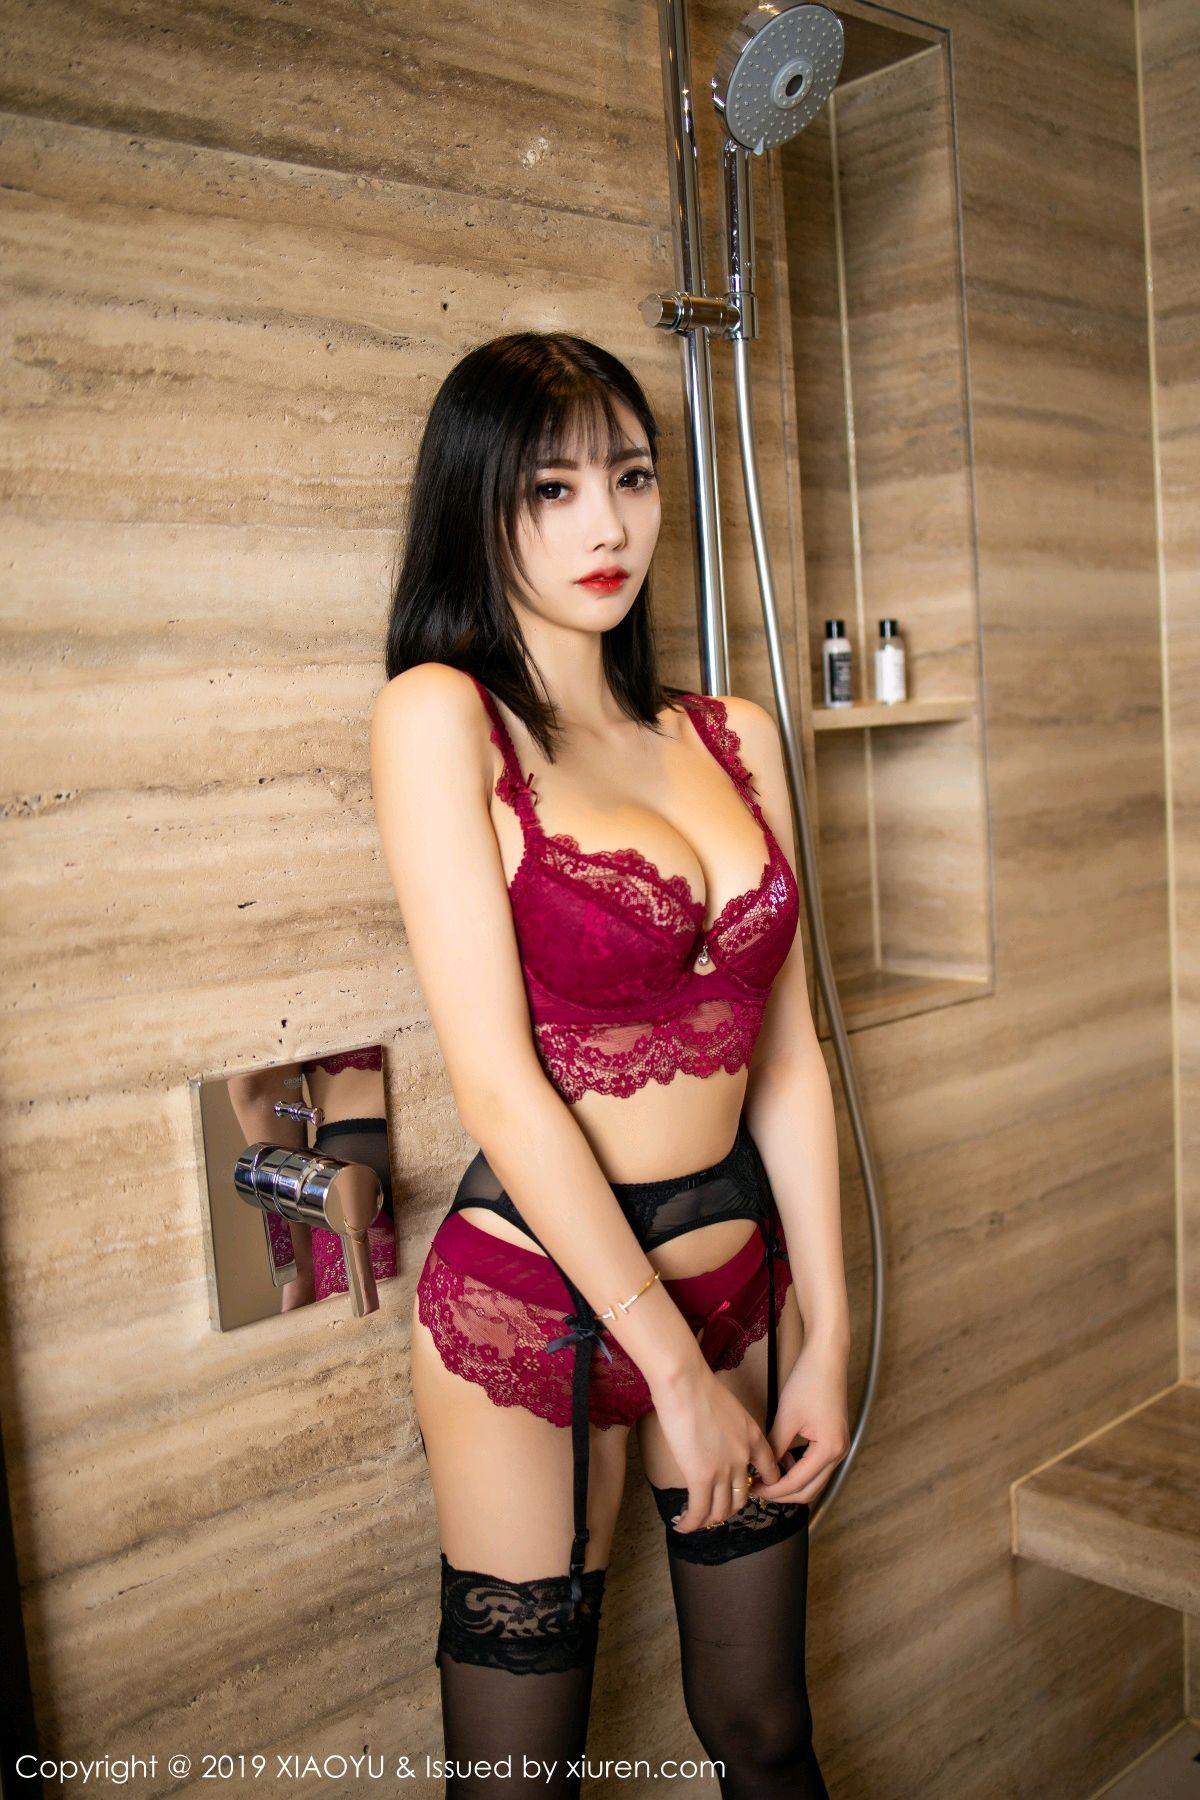 [XiaoYu] Vol.153 Yang Chen Chen 48P, Bathroom, Black Silk, Underwear, XiaoYu, Yang Chen Chen